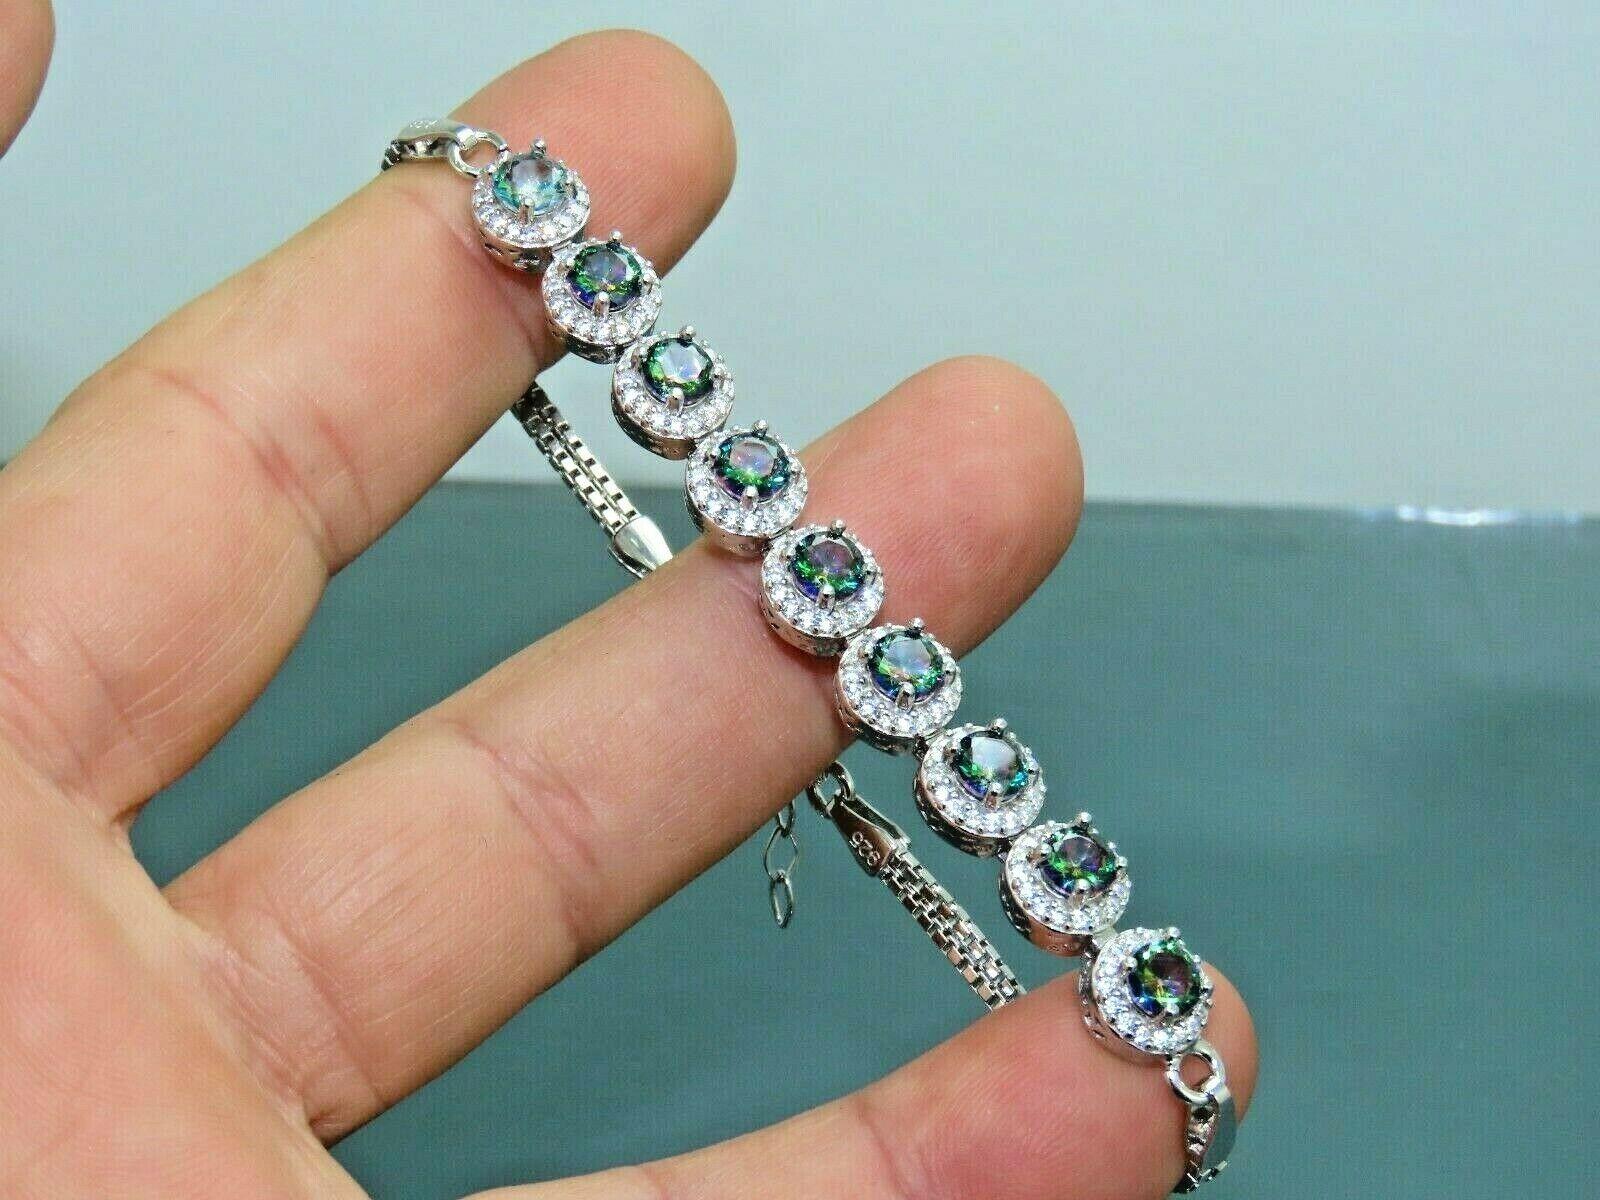 Turkish Handmade Jewelry 925 Sterling Silver Rainbow Stone Women Bracelet